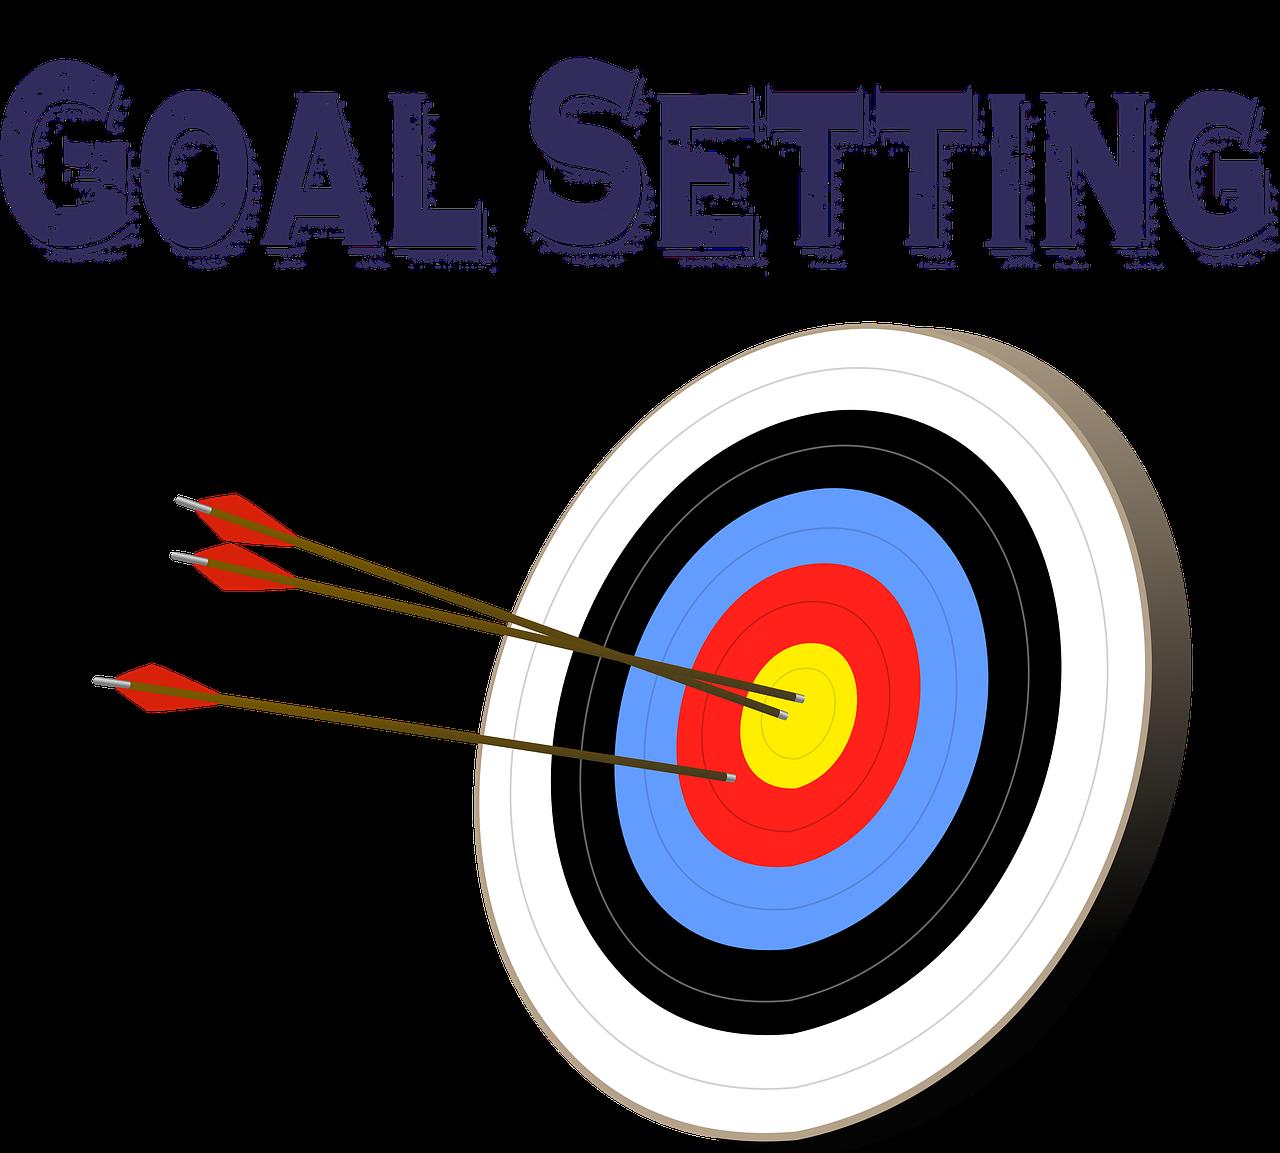 Goals clipart goal target. Png transparent images all